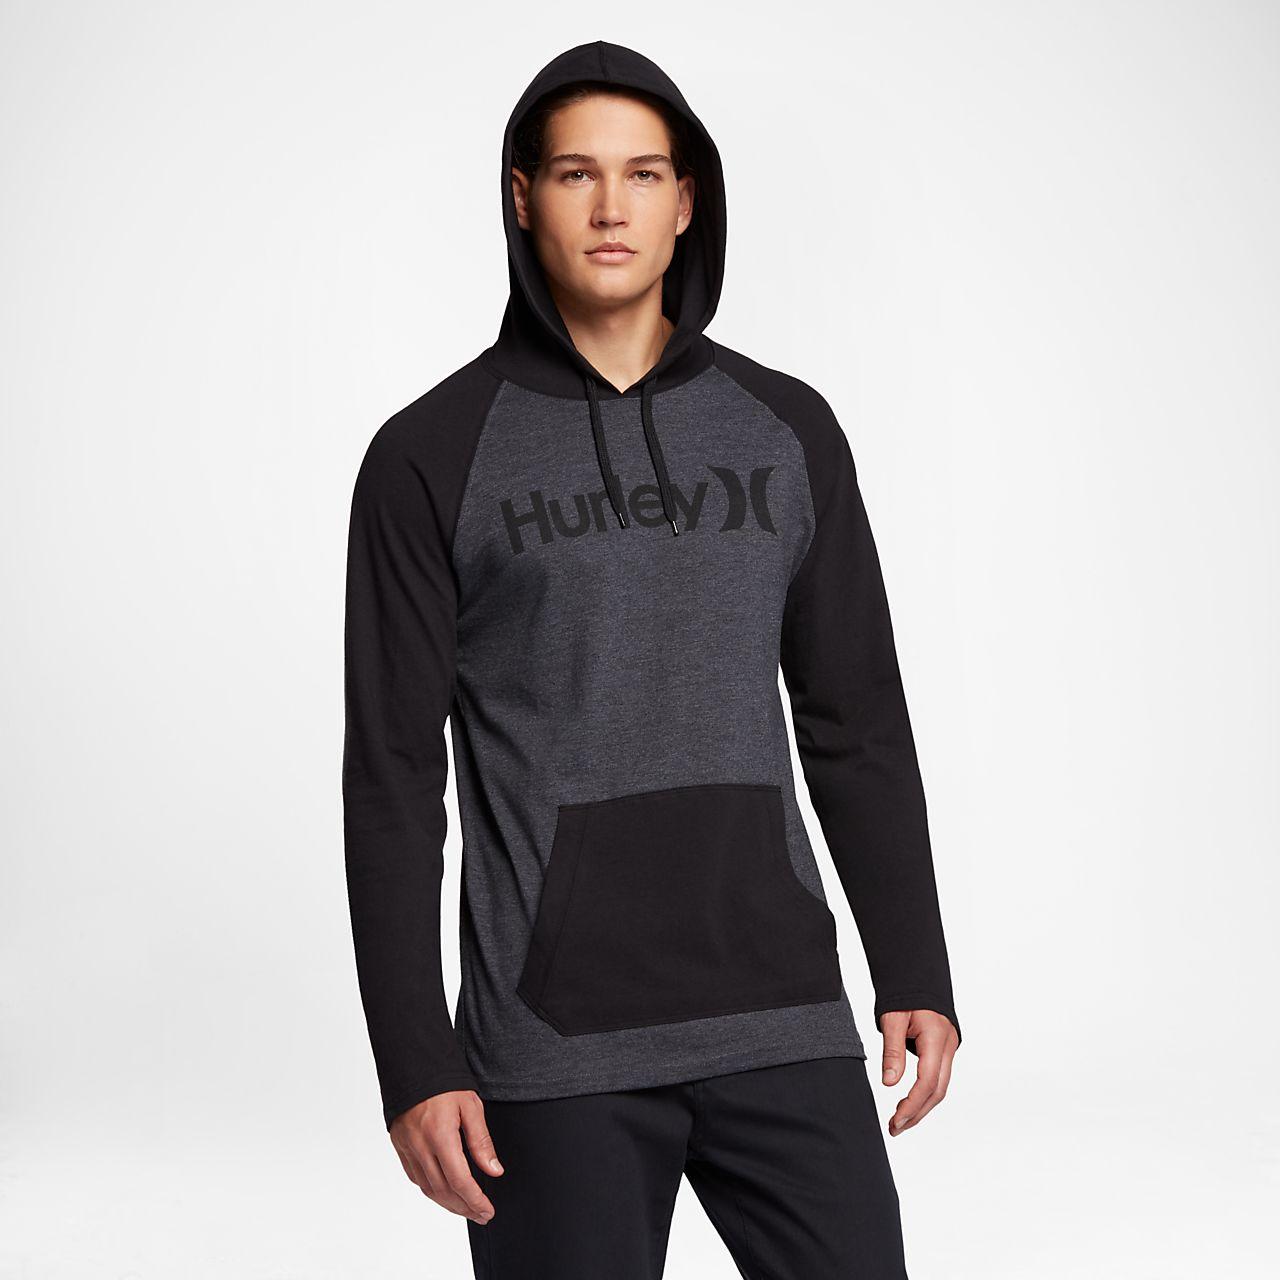 013ee2546c41 Hurley One And Only Raglan Jersey Men s Hoodie. Nike.com ZA